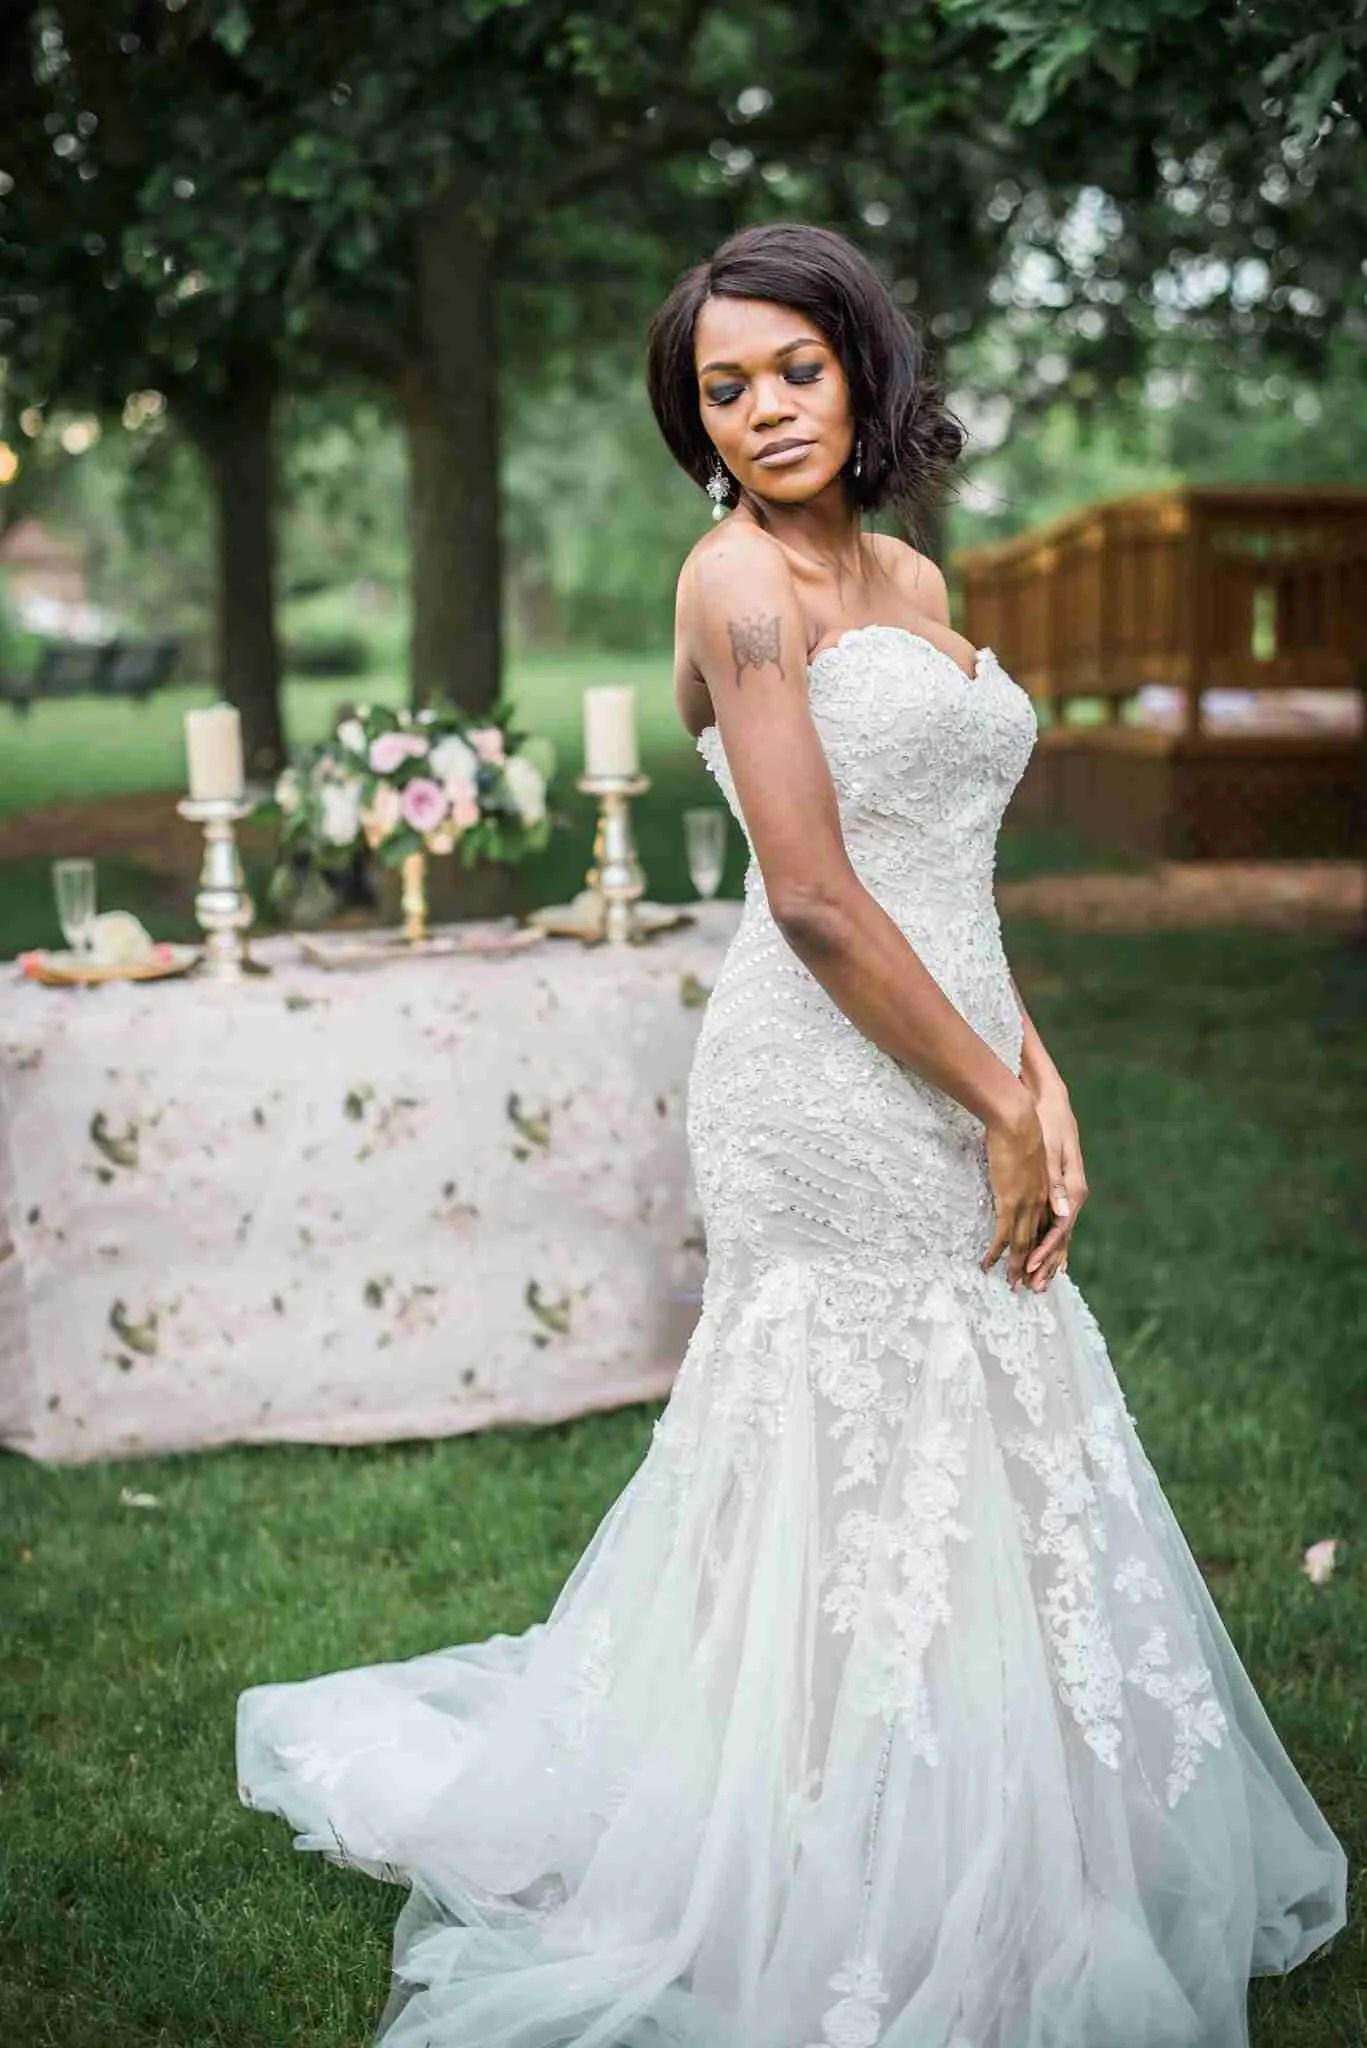 Mermaid Wedding Dress By Brides Amp Tailor